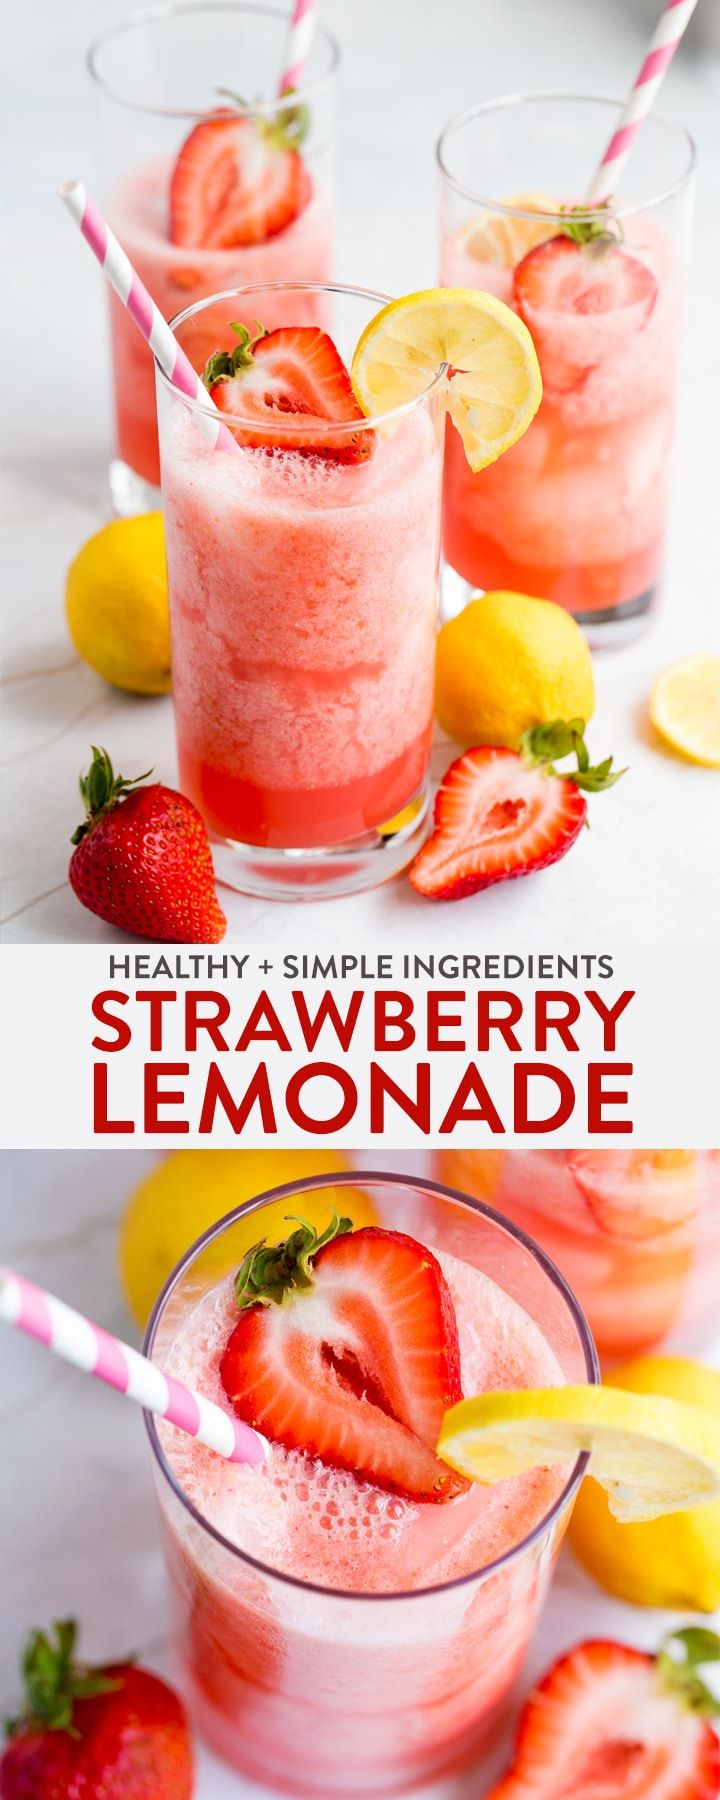 Strawberry Lemonade #easylemonaderecipe